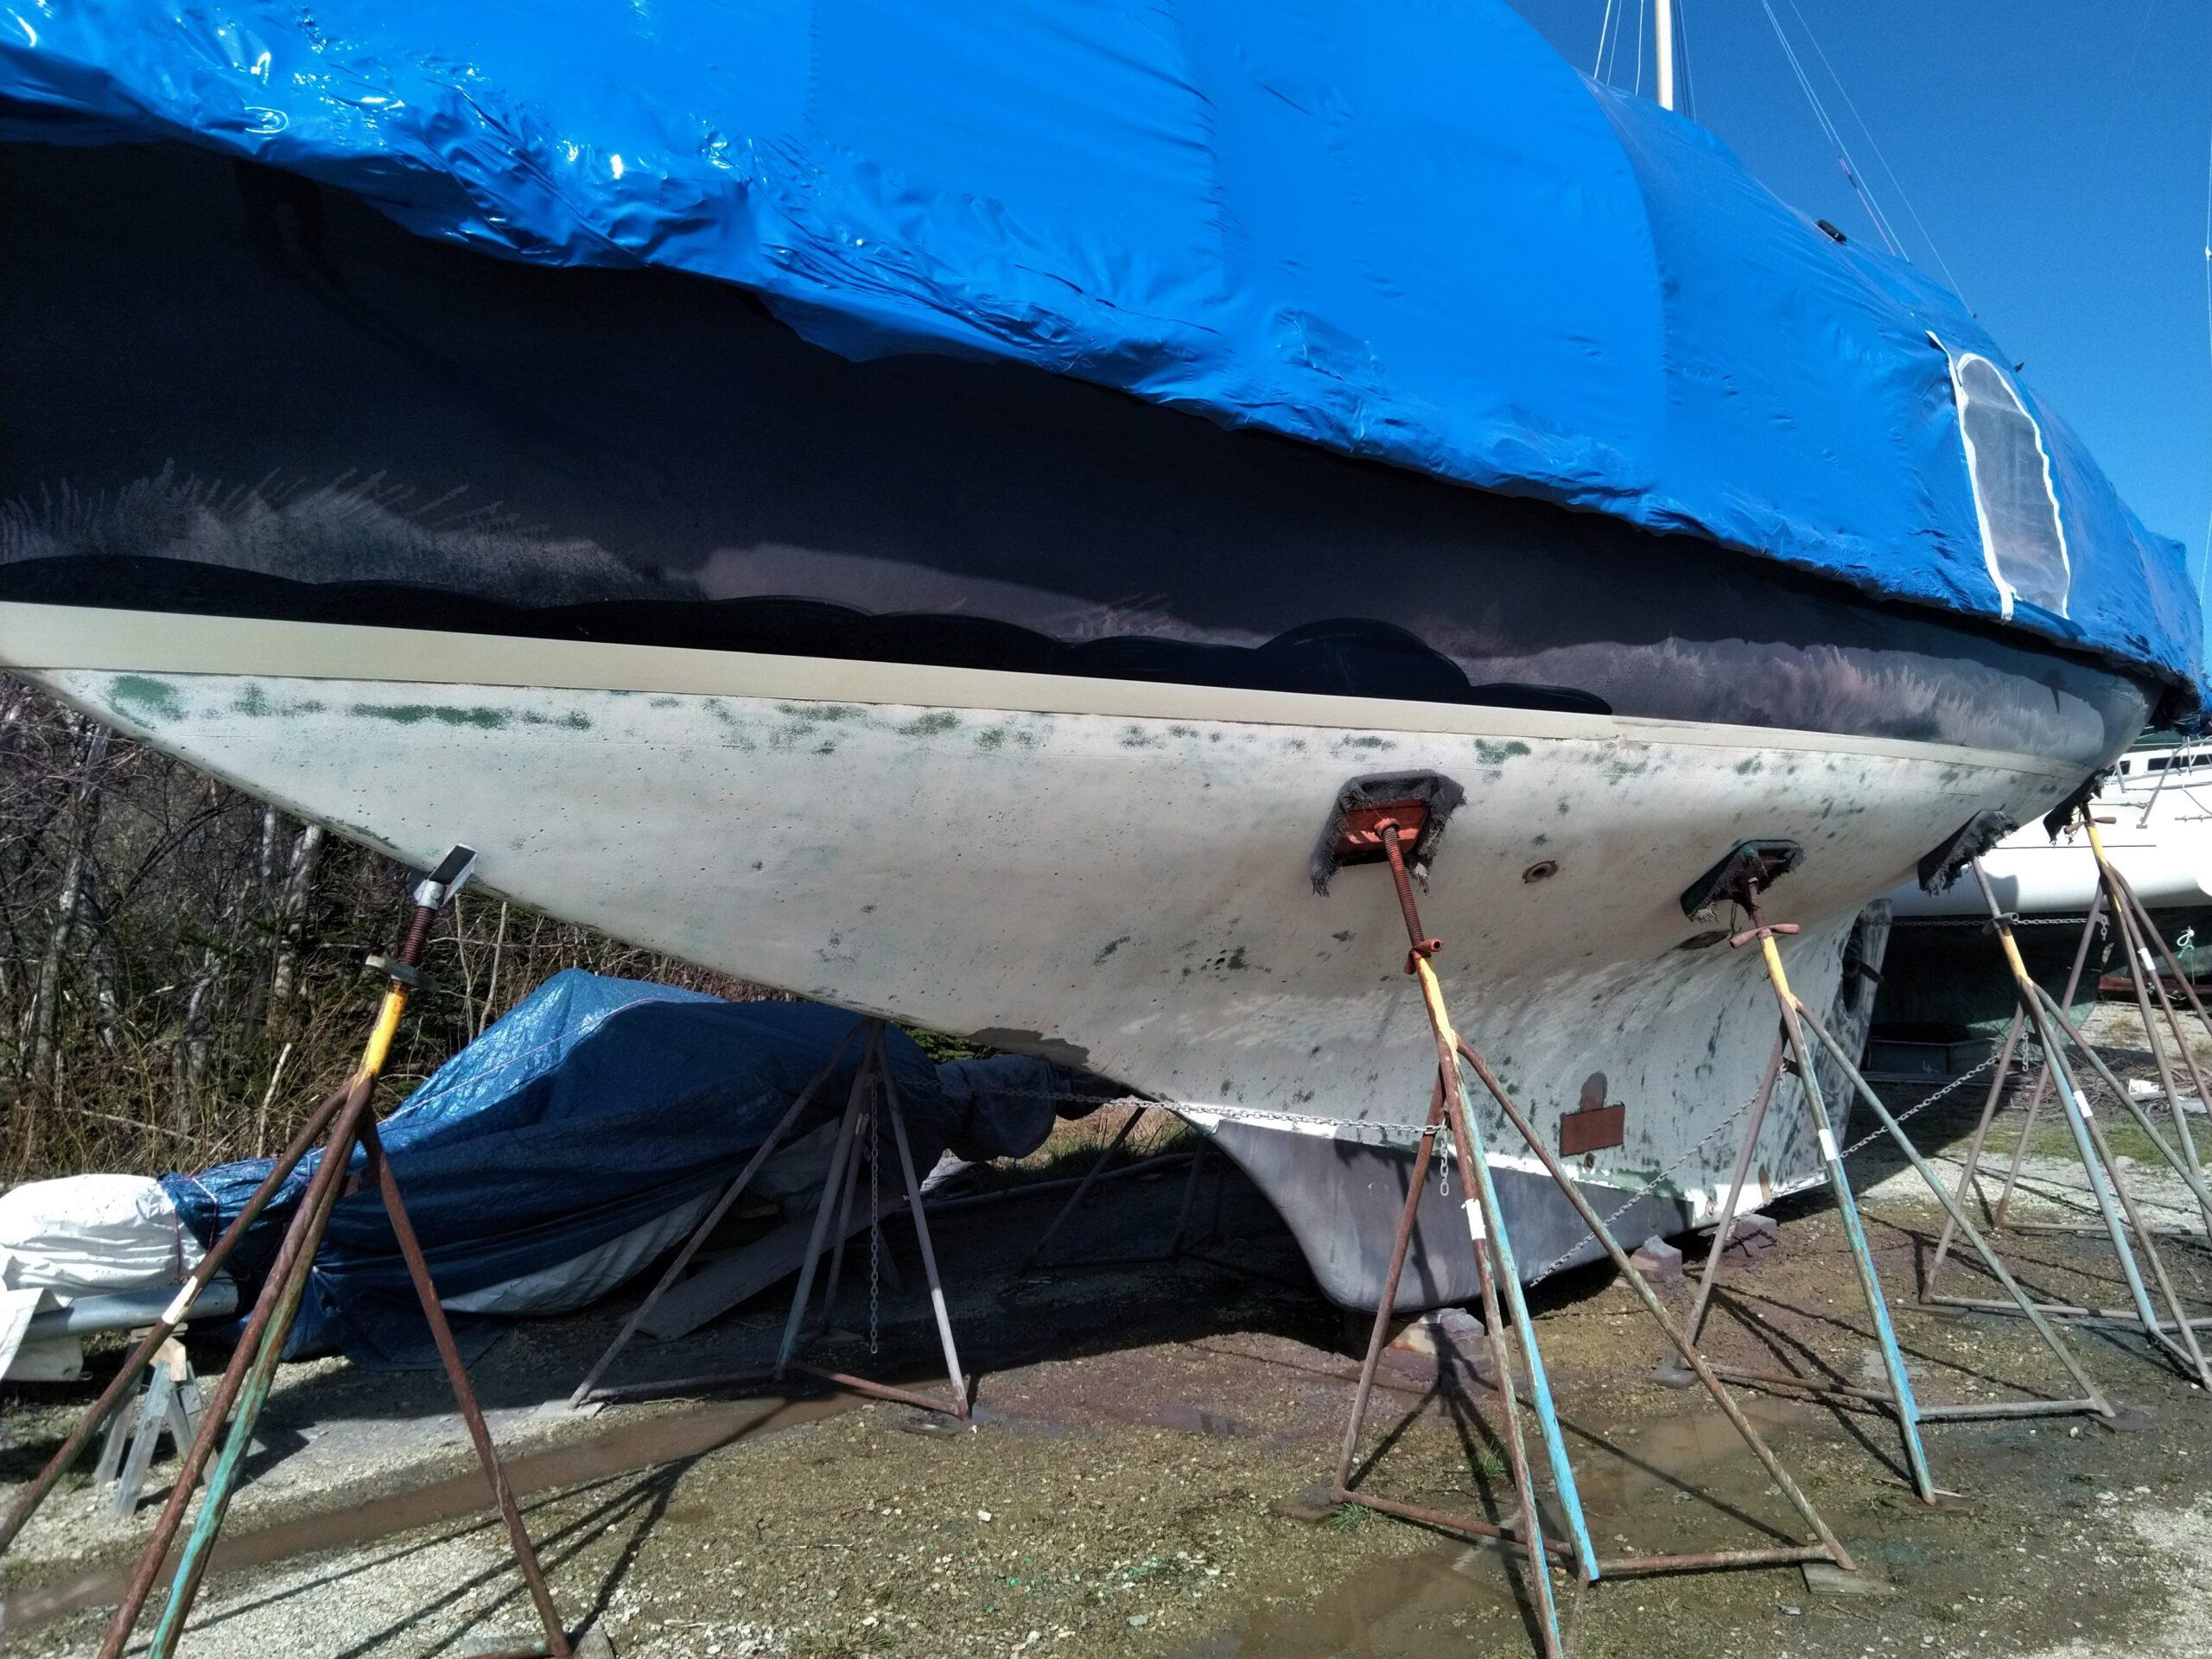 Maritime Blasting Sail boat 1 after